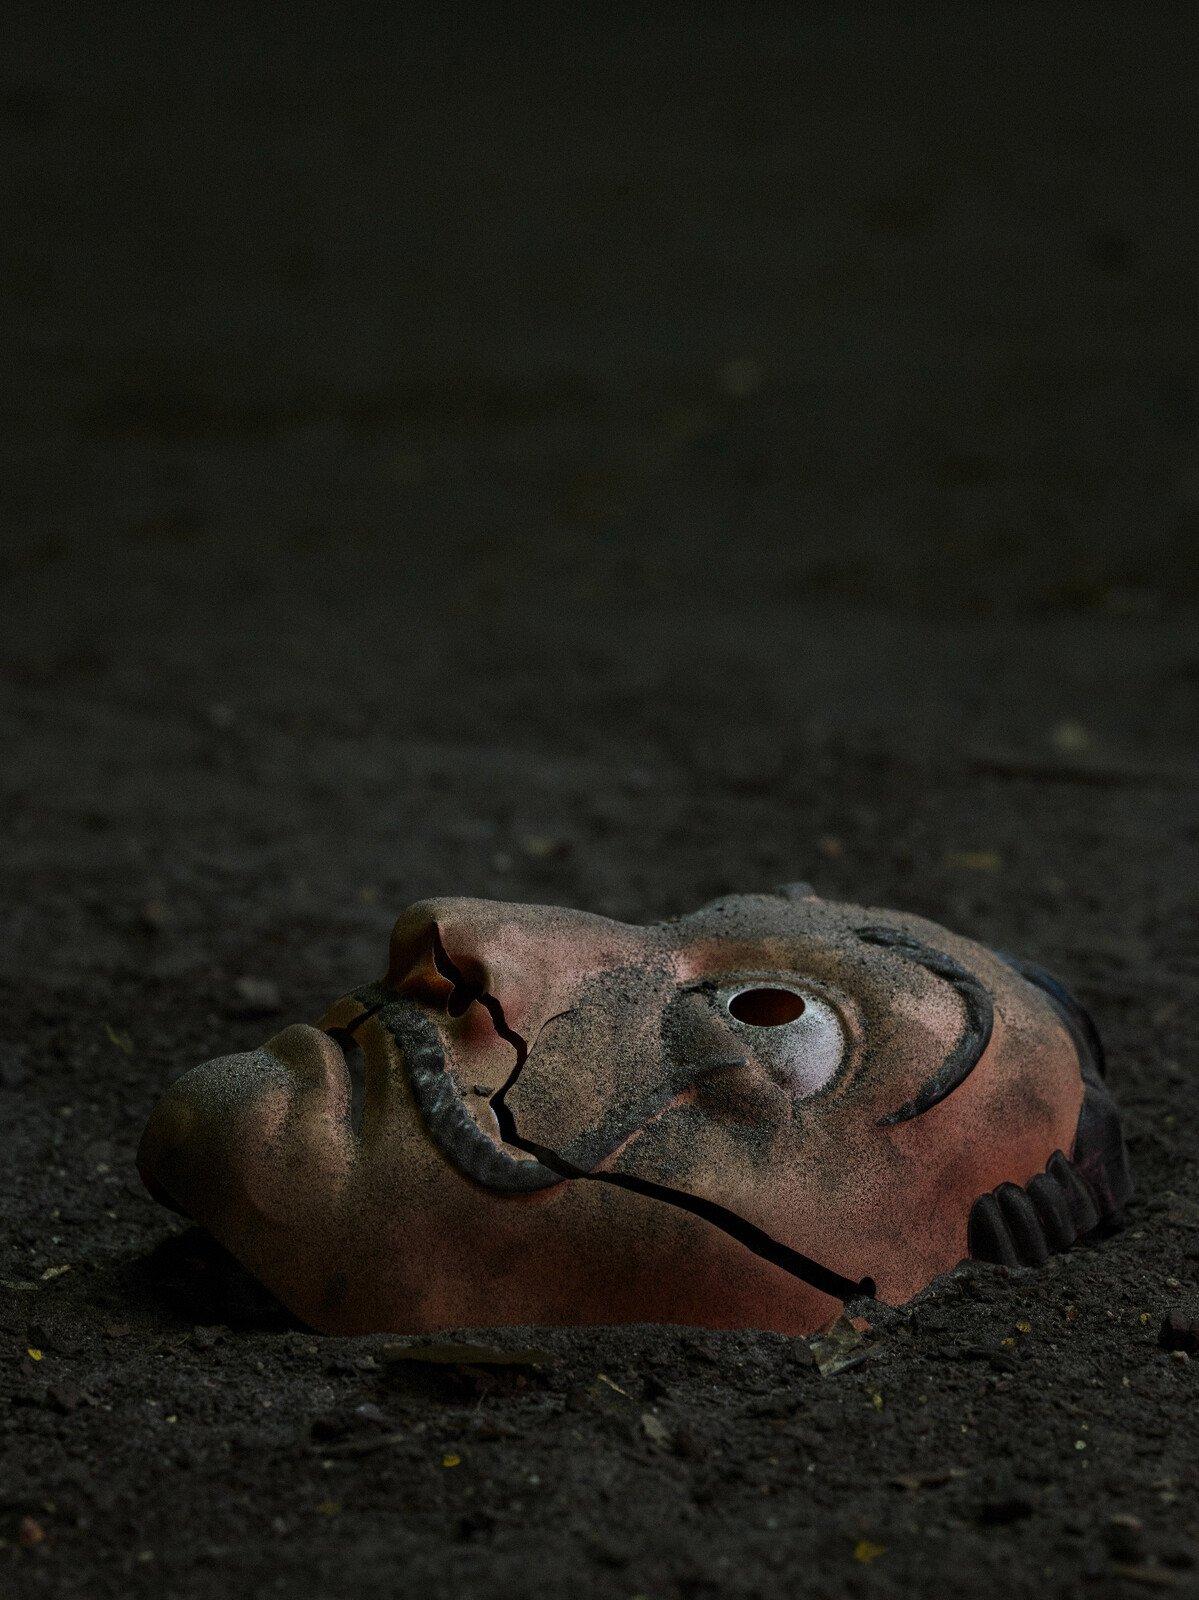 LCDP5_Mask_FULLRES